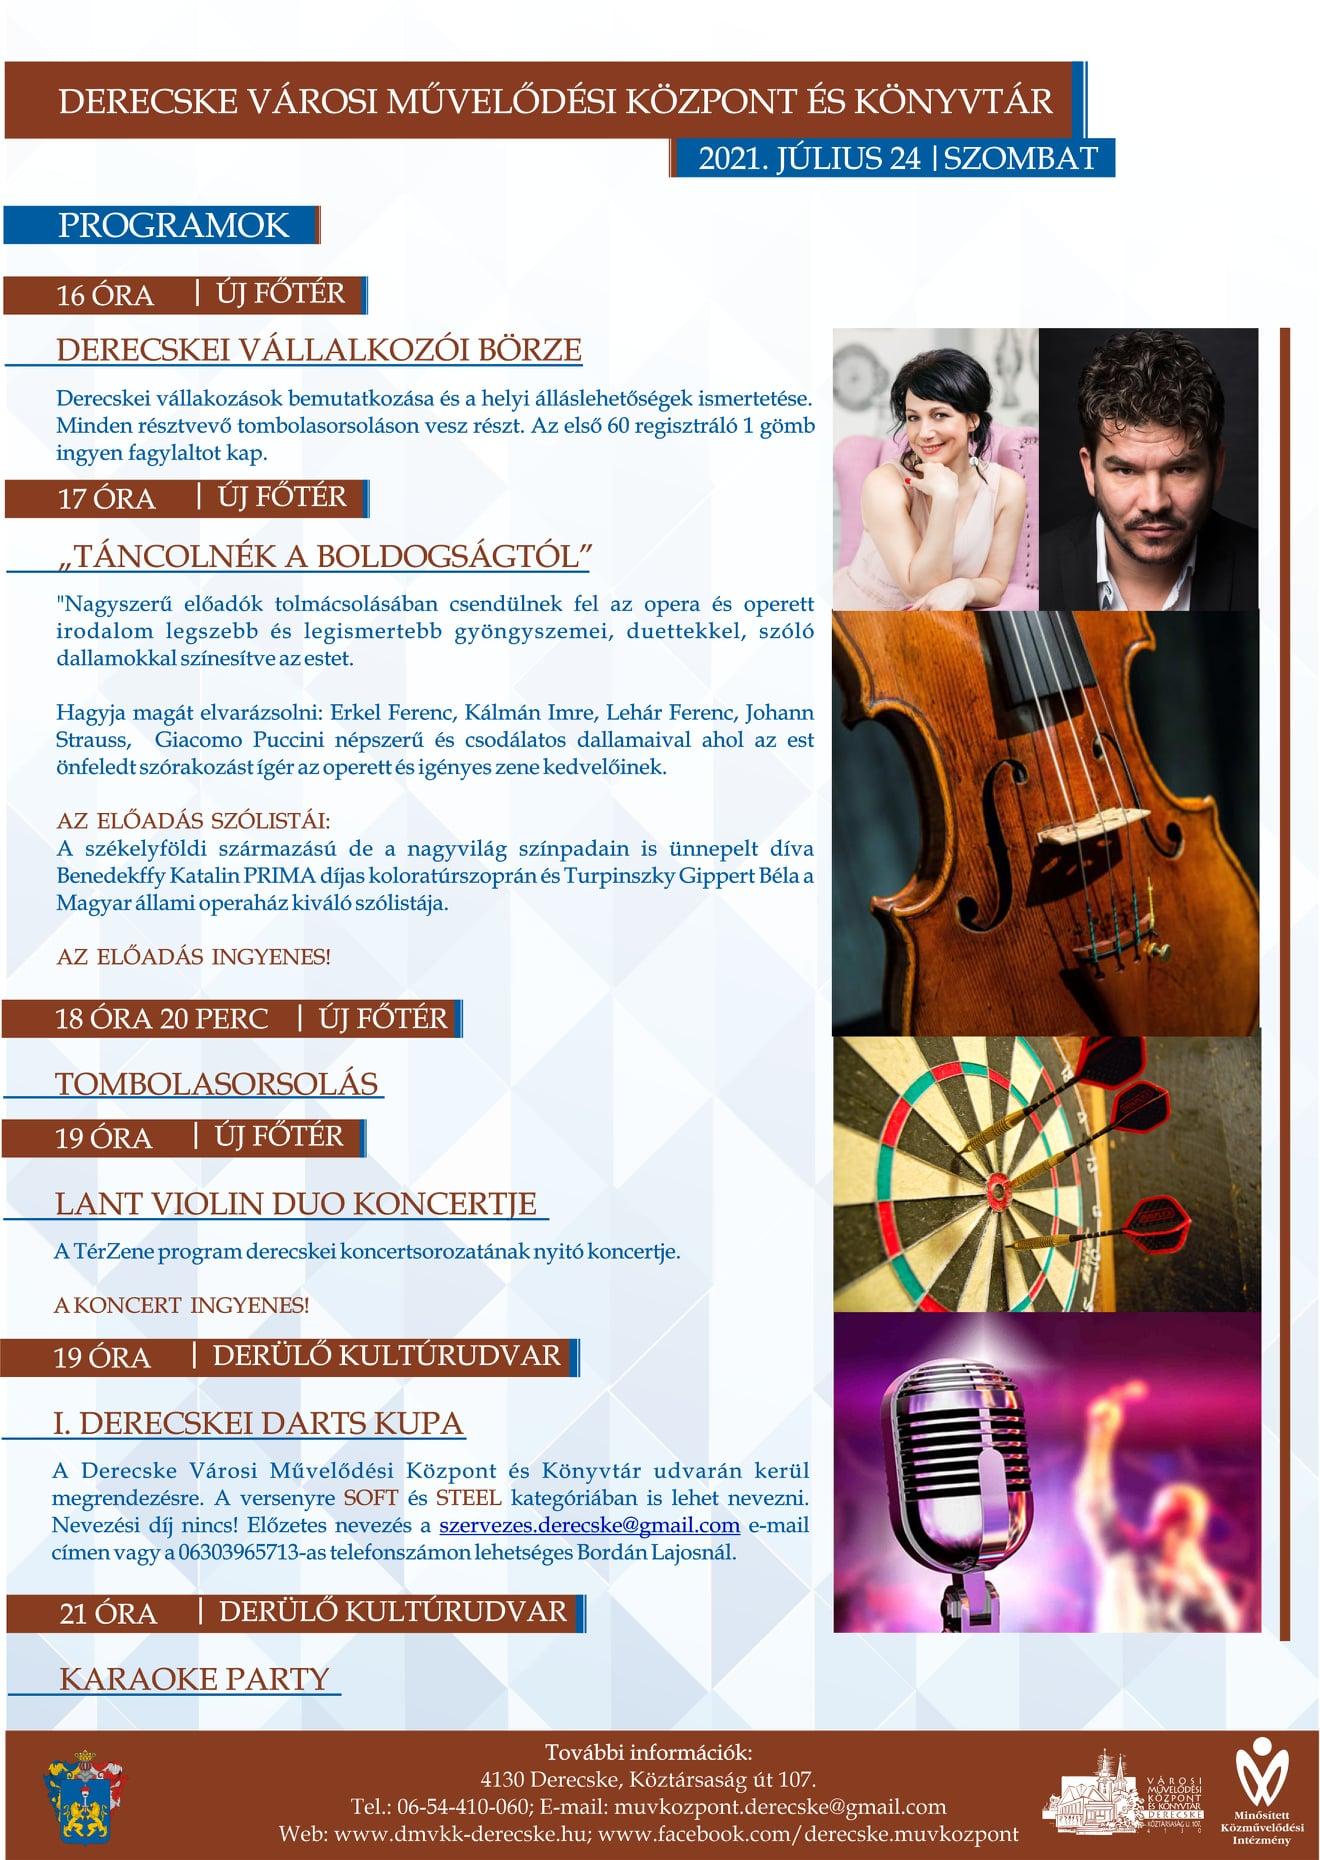 Július 24-i programok